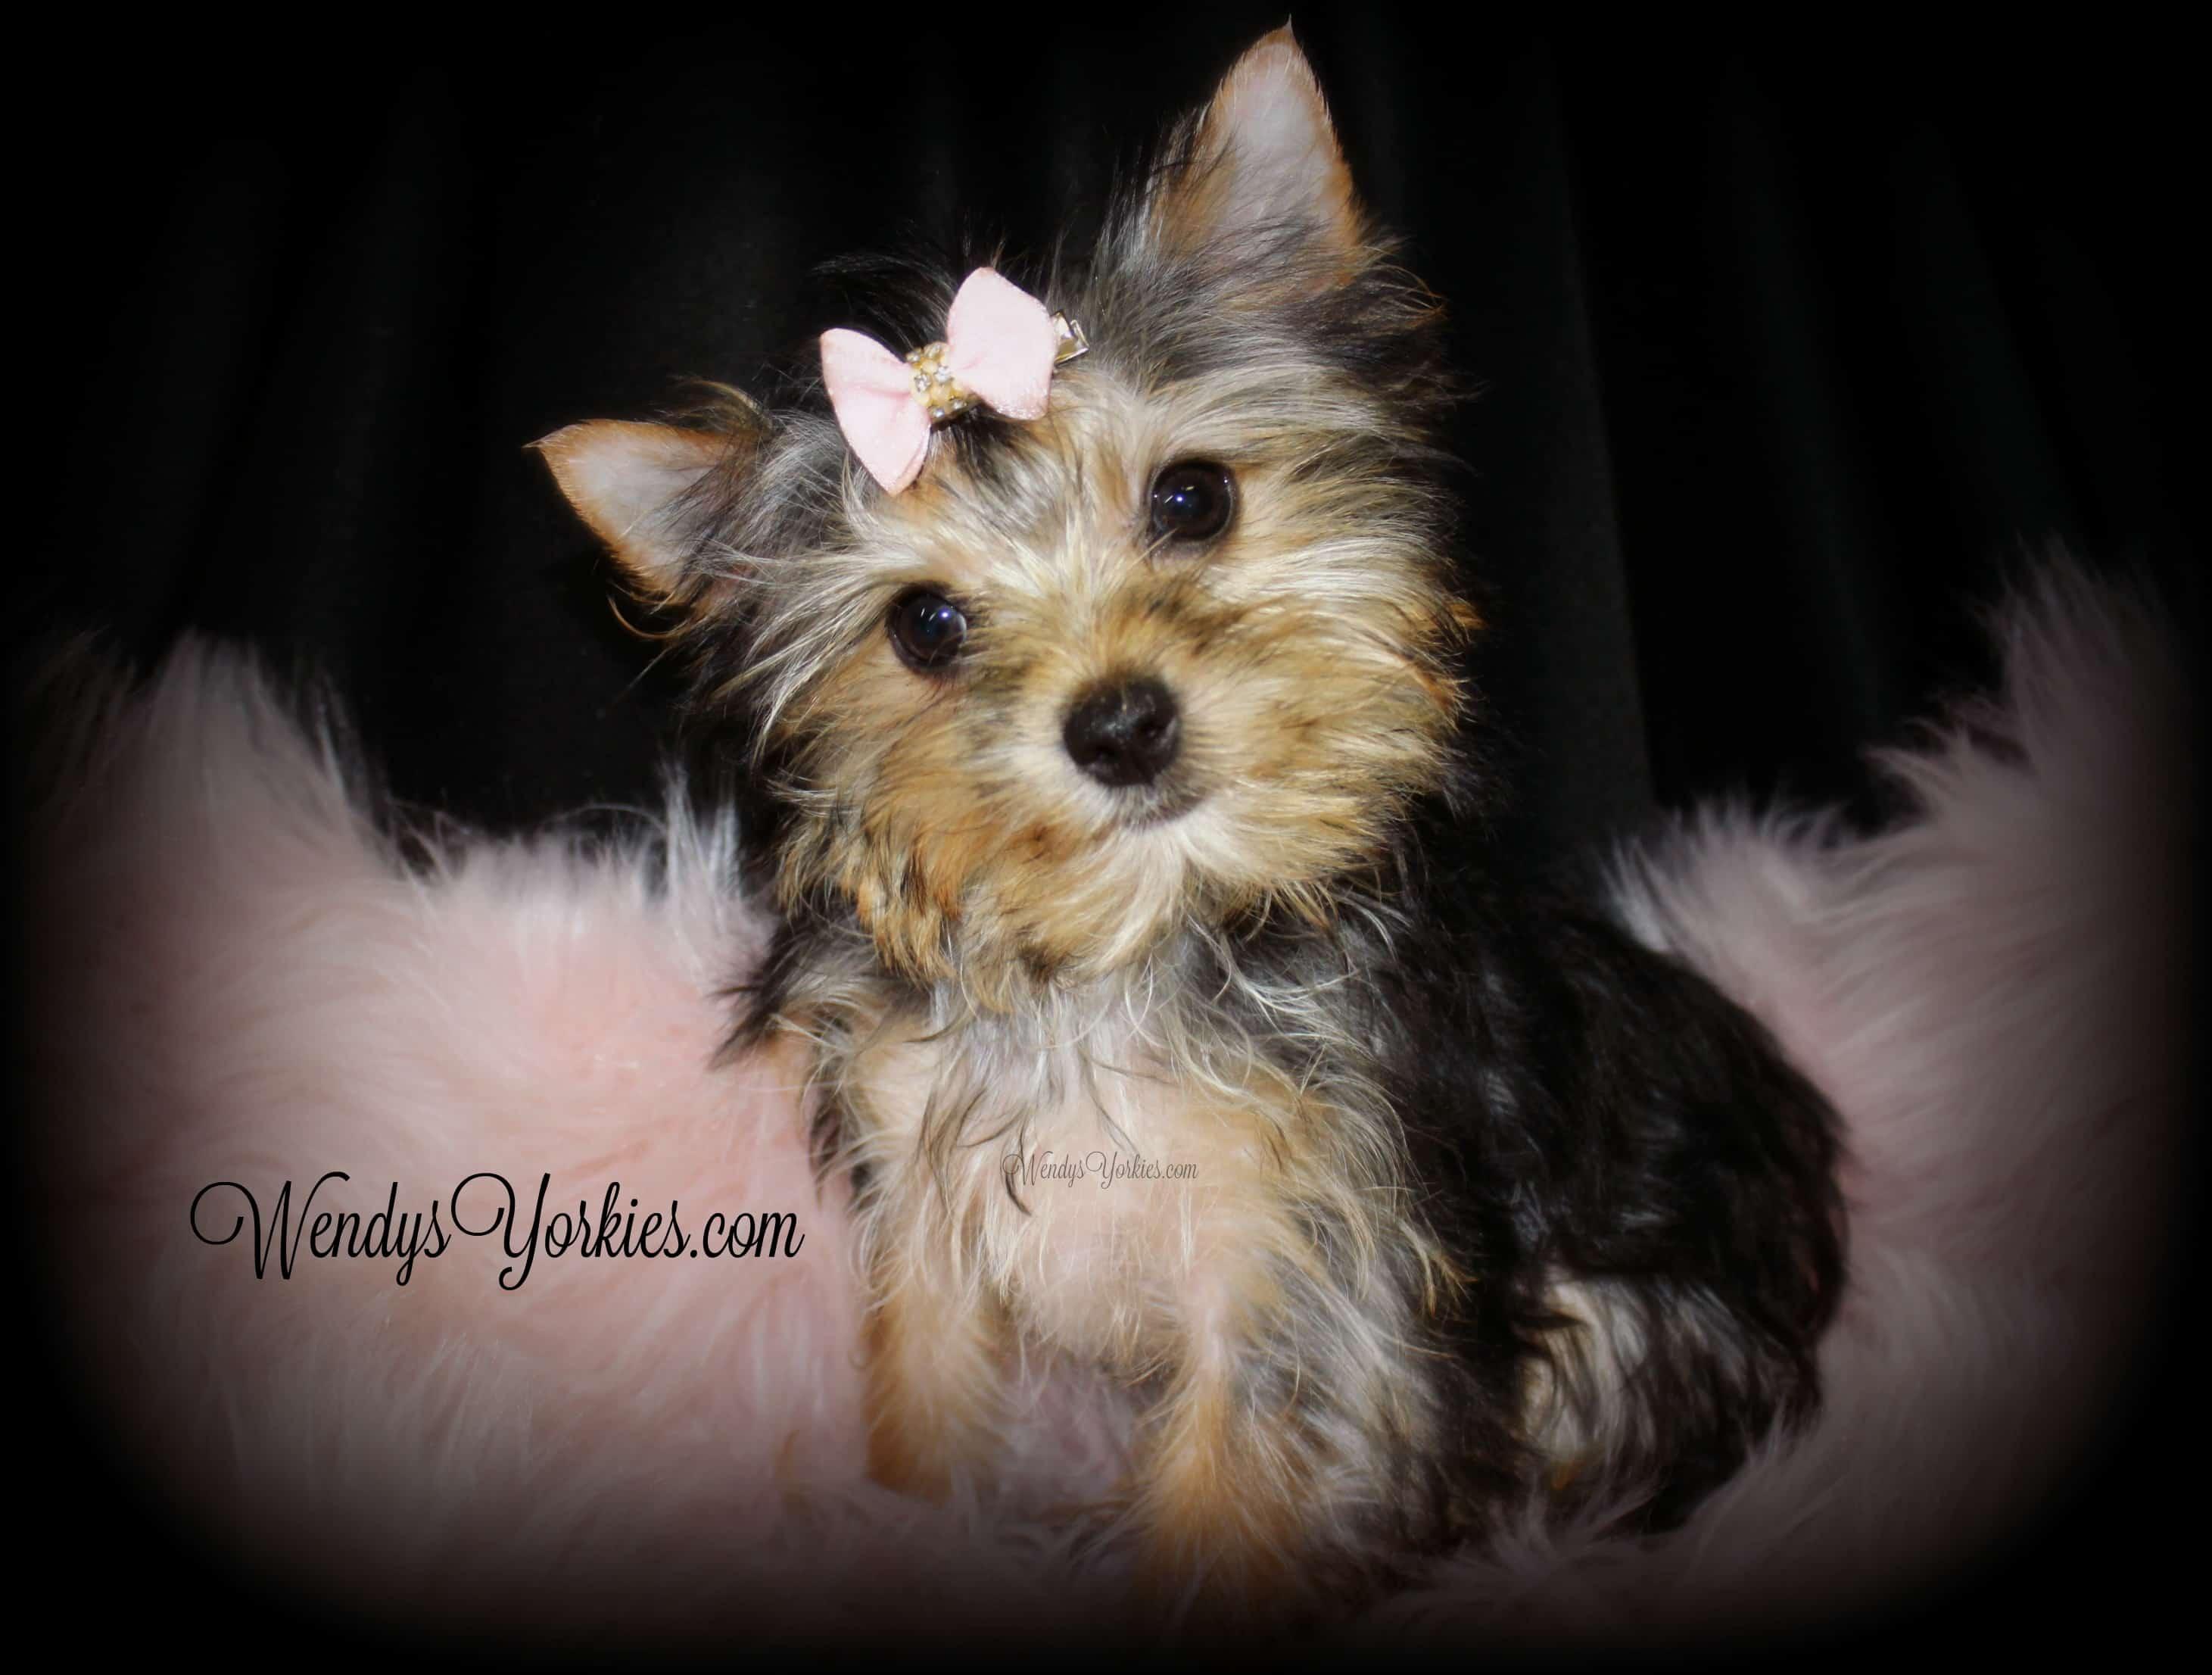 Teacup Yorkie puppy for sale, WendysYorkies.com, Lou lou f1